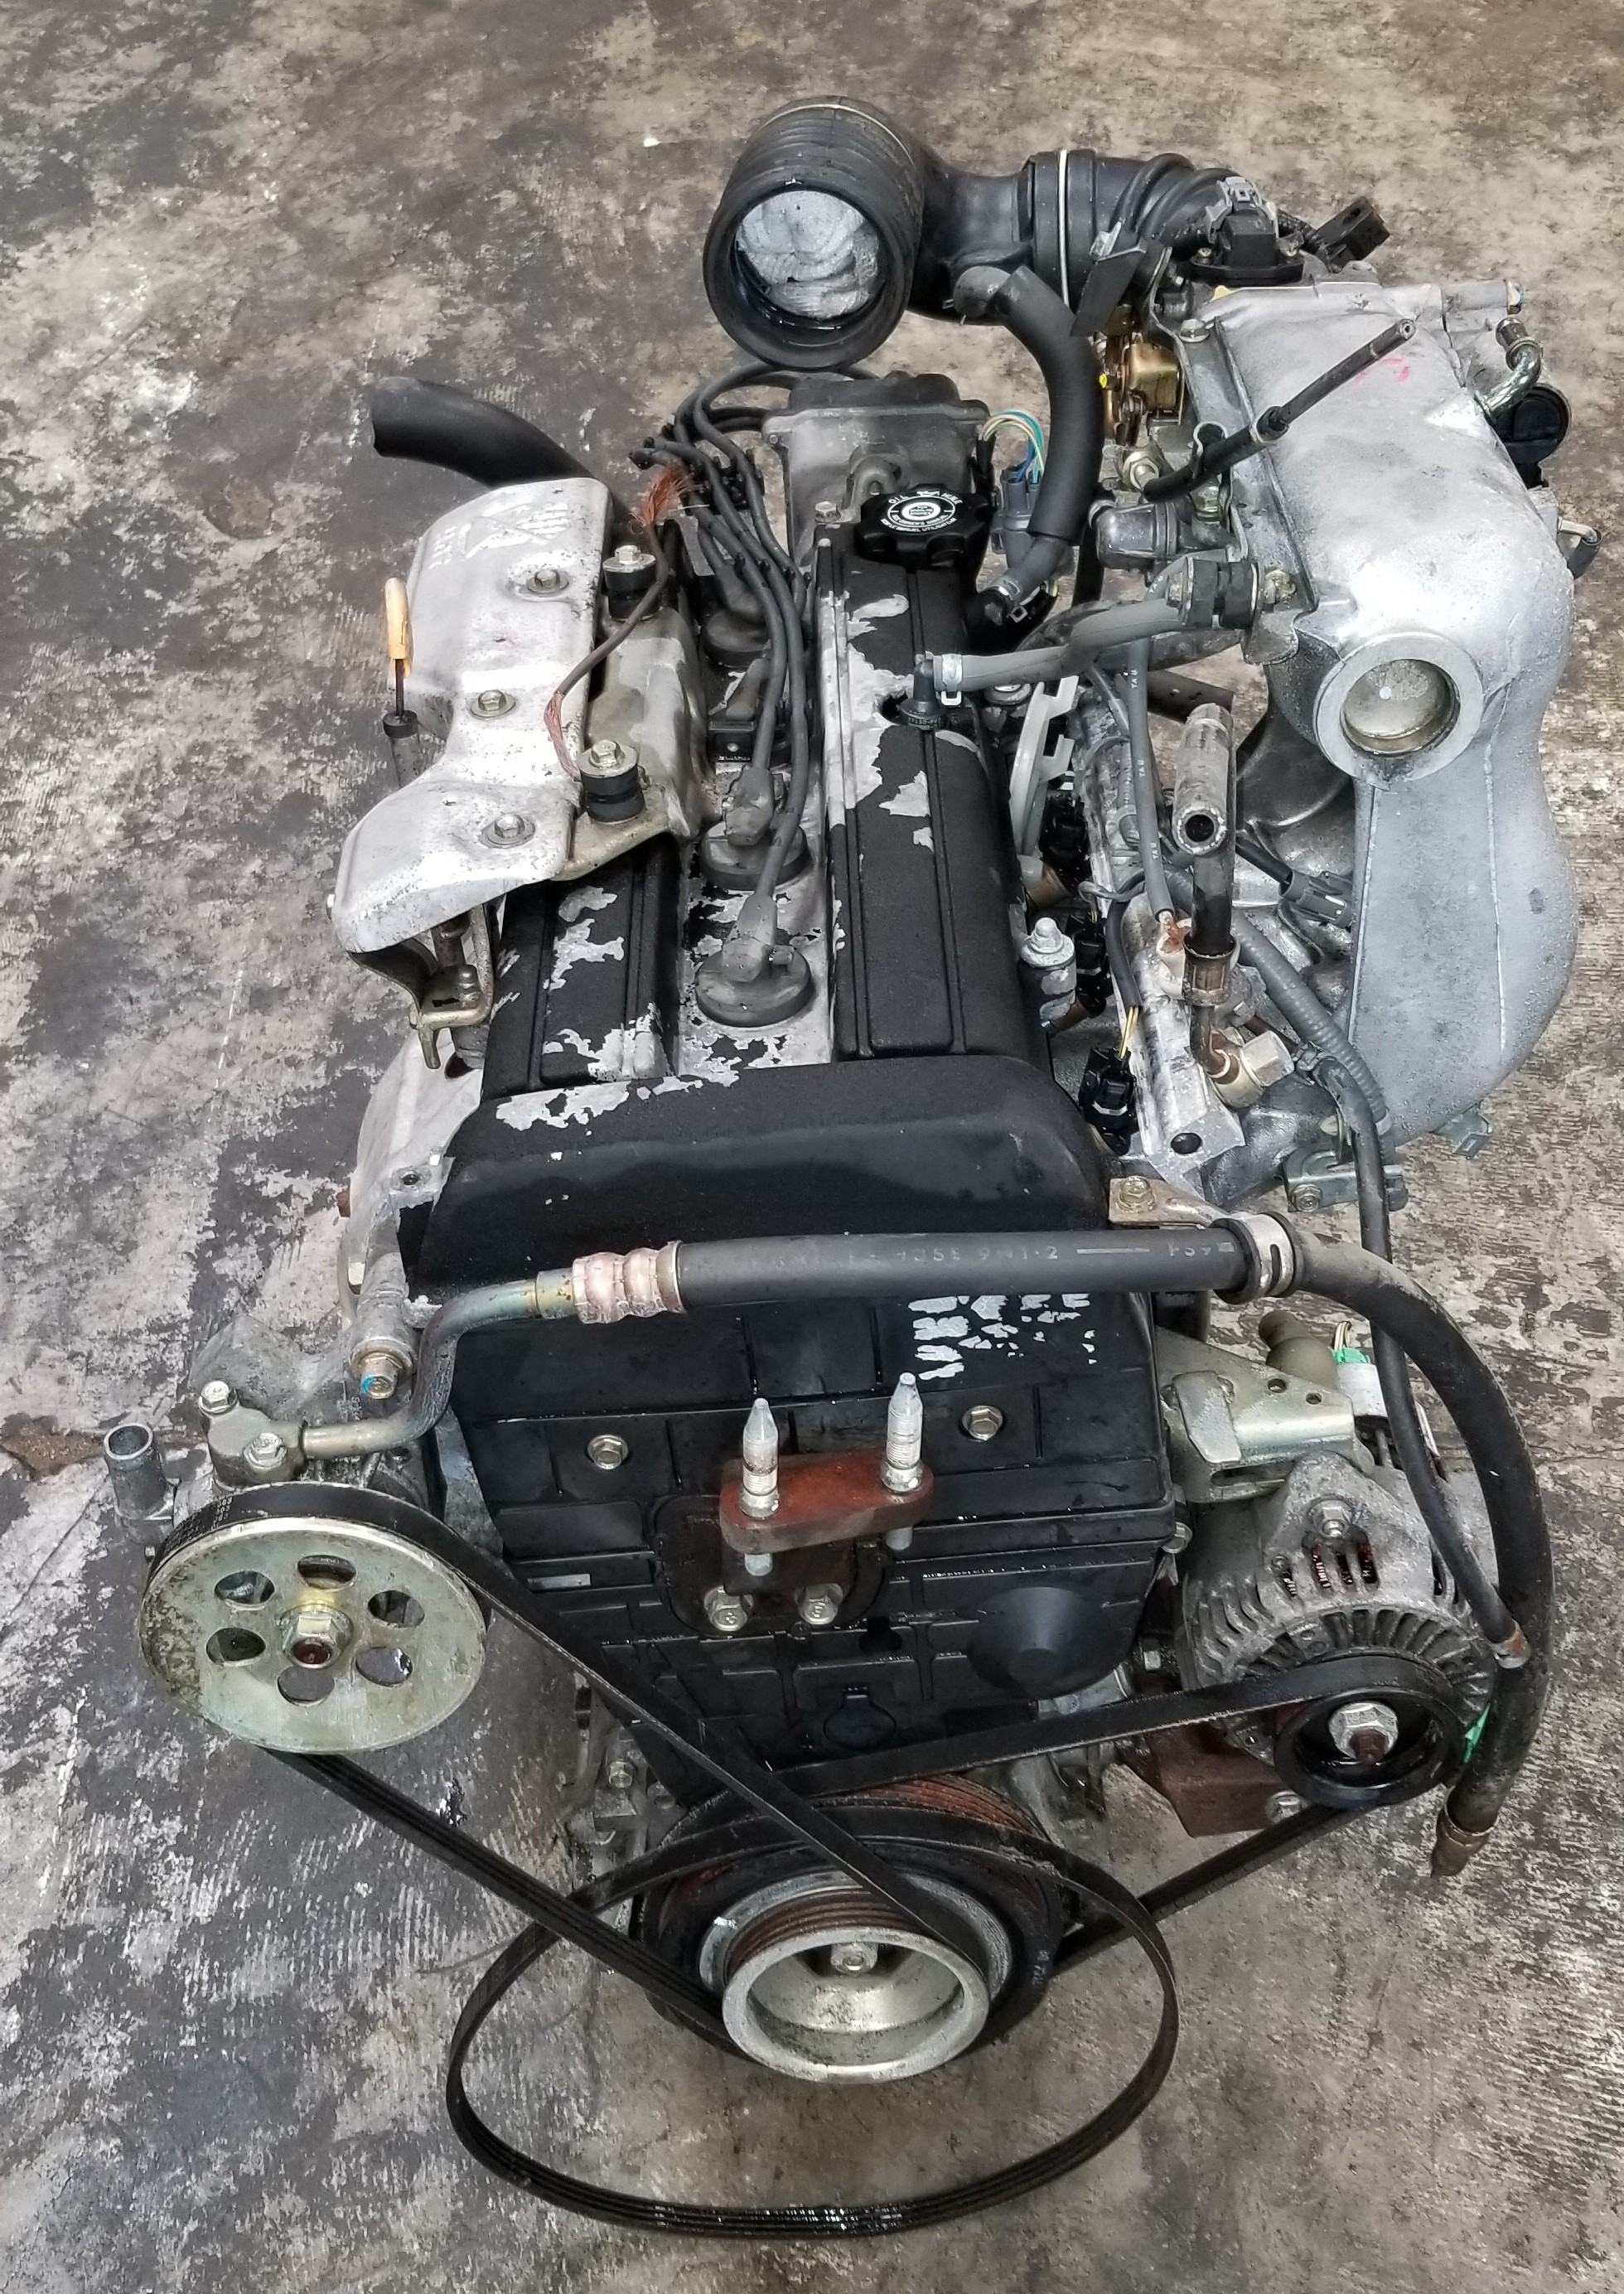 Honda Chula Vista >> B20B 1997-1999 JDM Honda CRV Civic Integra B20 DOHC Engine Non-Vtec Low Comp | JDM Of San Diego